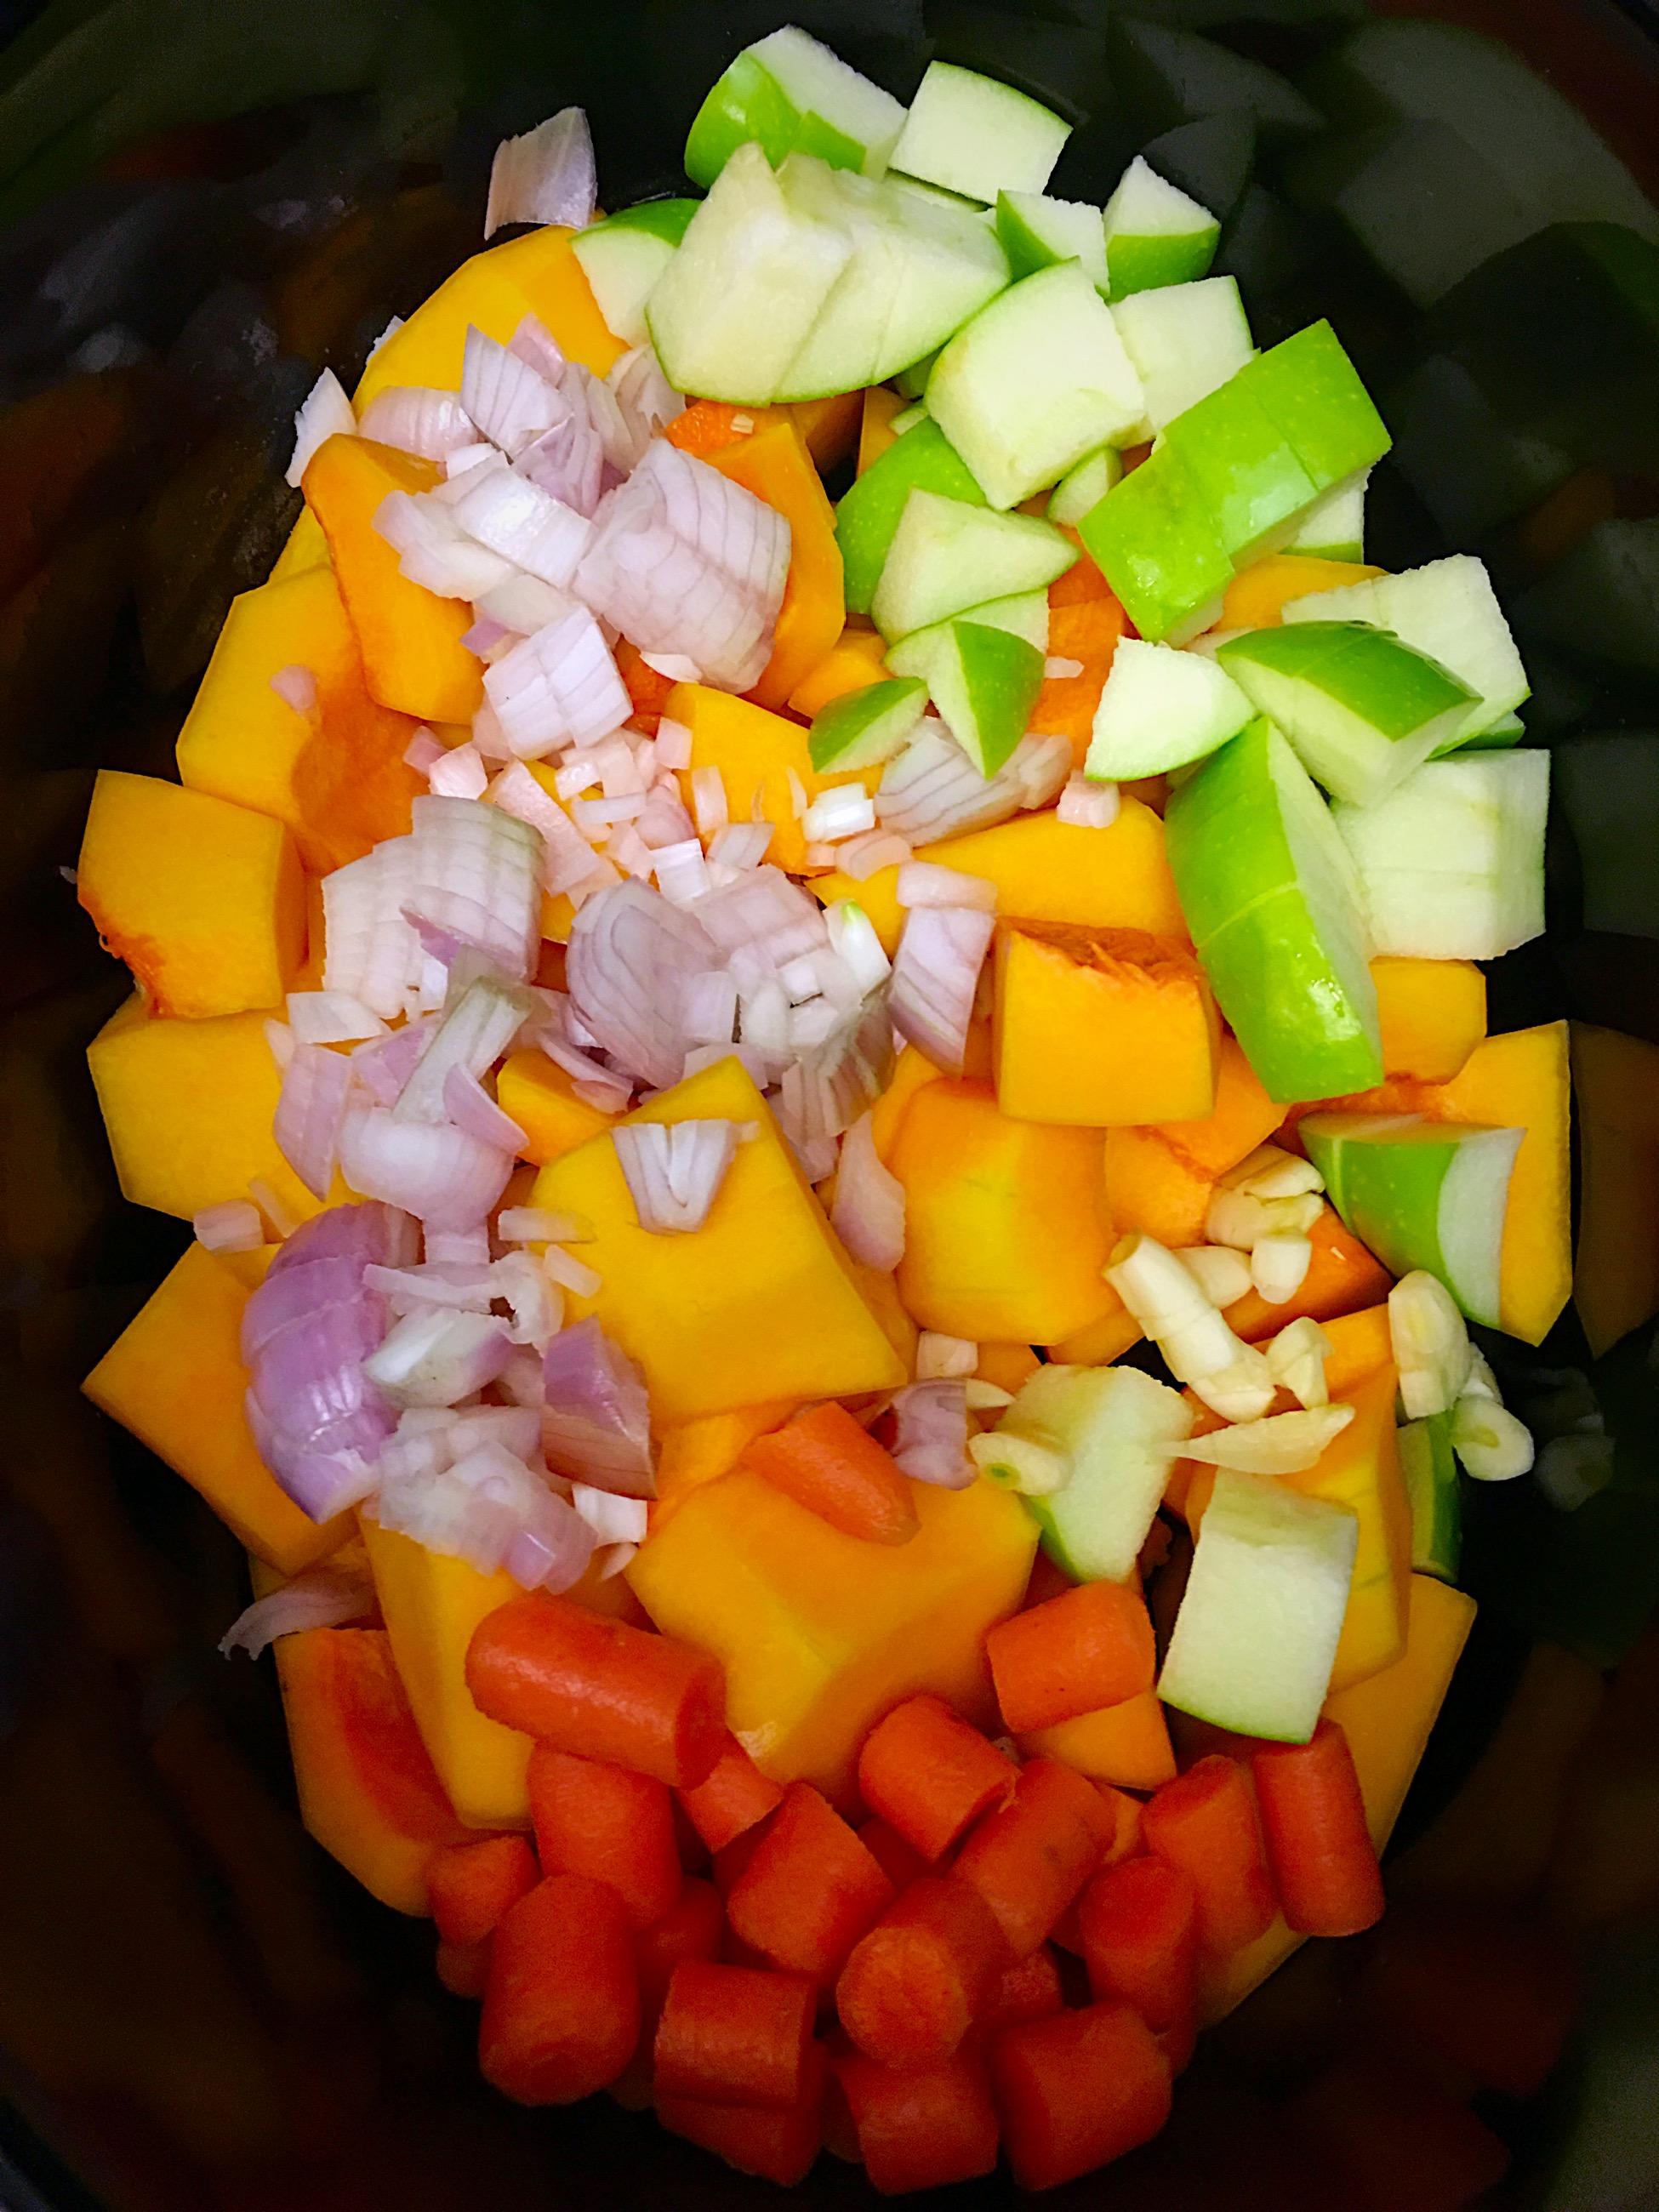 add your chopped veggies